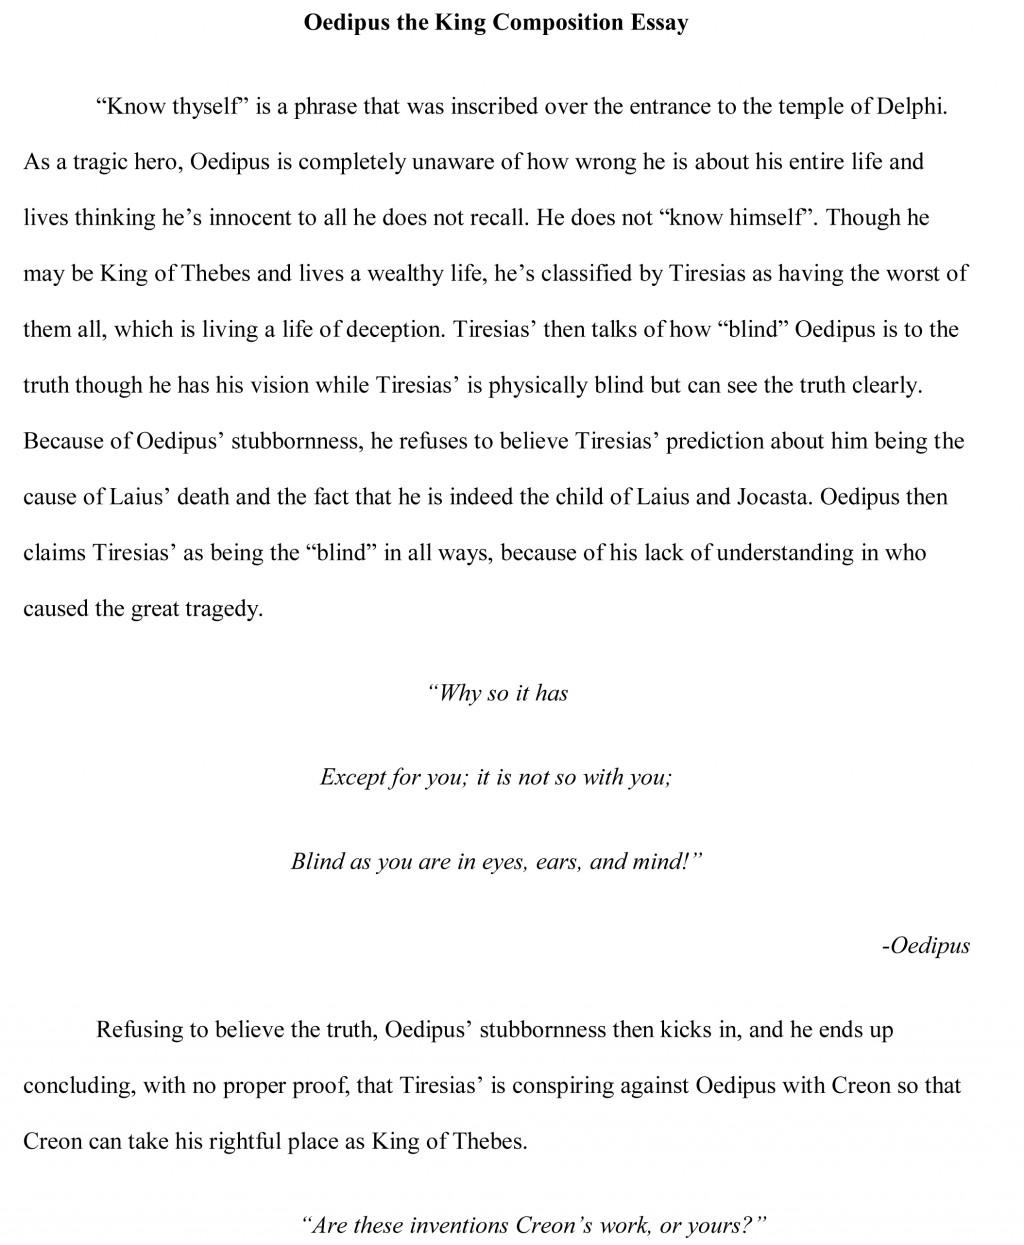 012 Interesting Essay Topics Oedipus Free Sample Amazing For Grade 7 9 Pat 7th Large